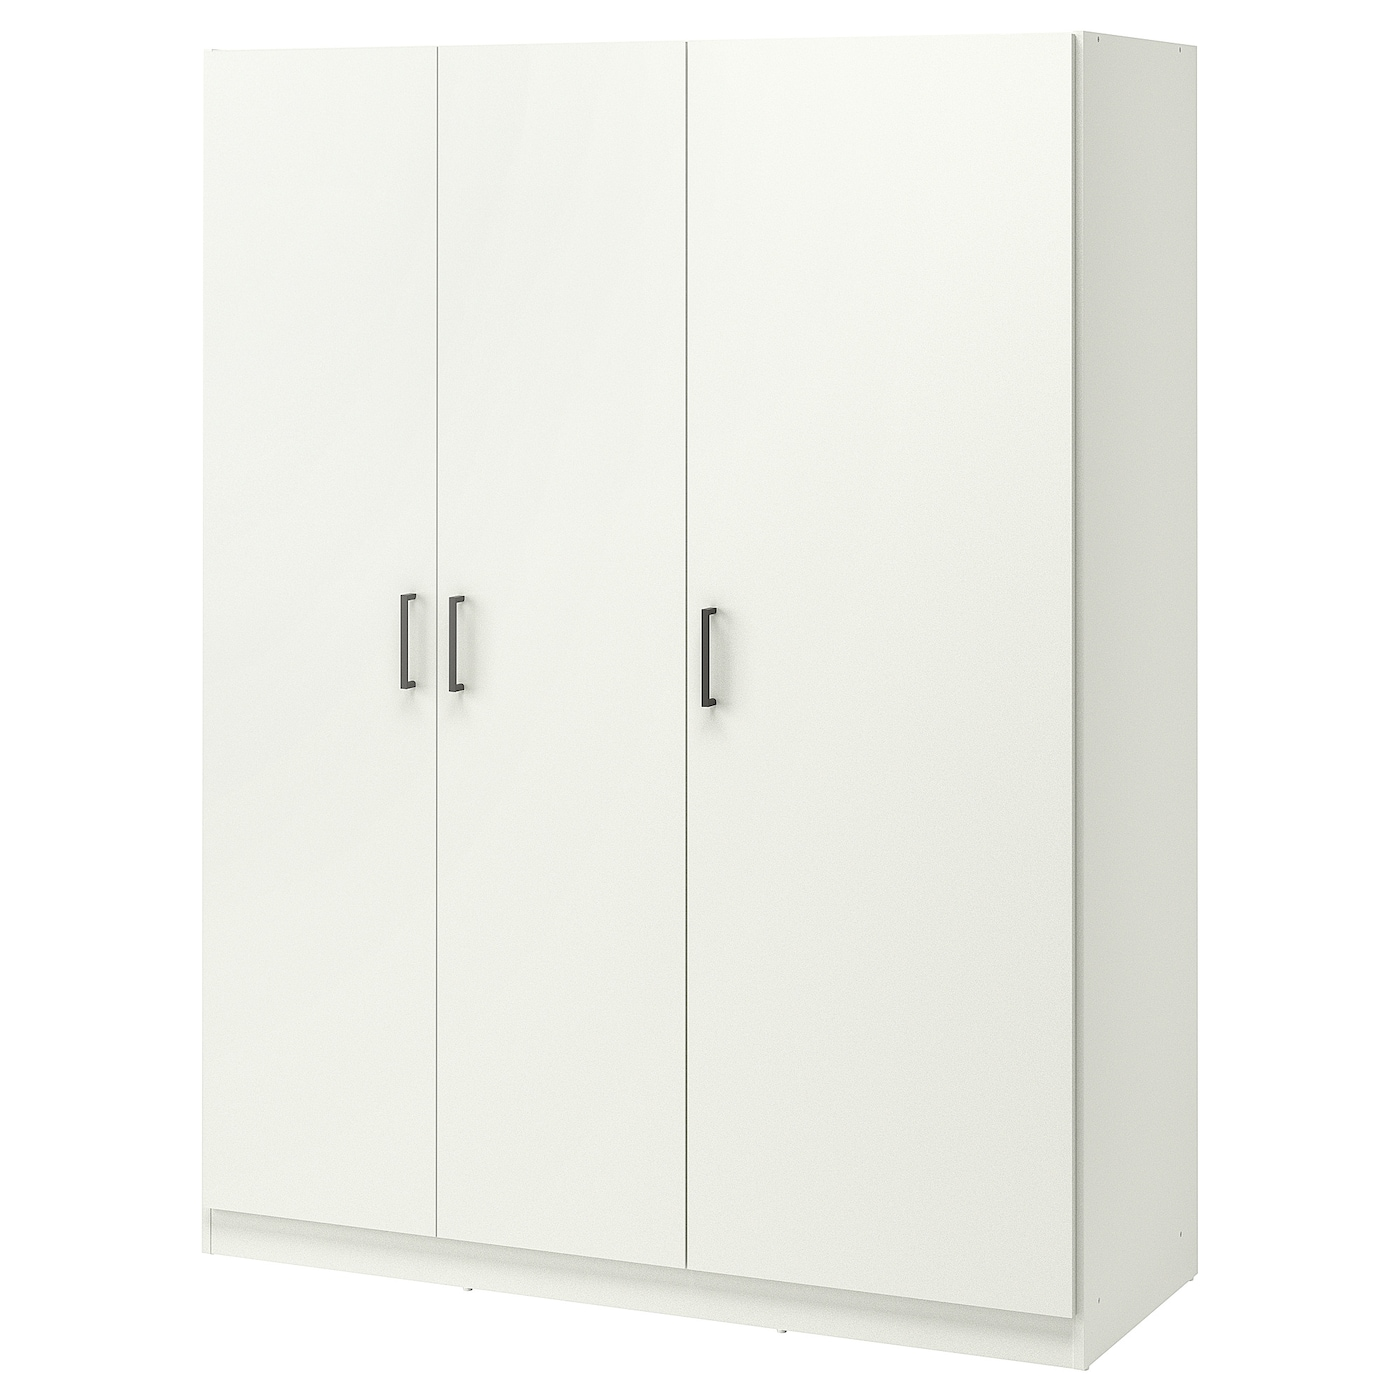 armoires portes battantes ikea. Black Bedroom Furniture Sets. Home Design Ideas